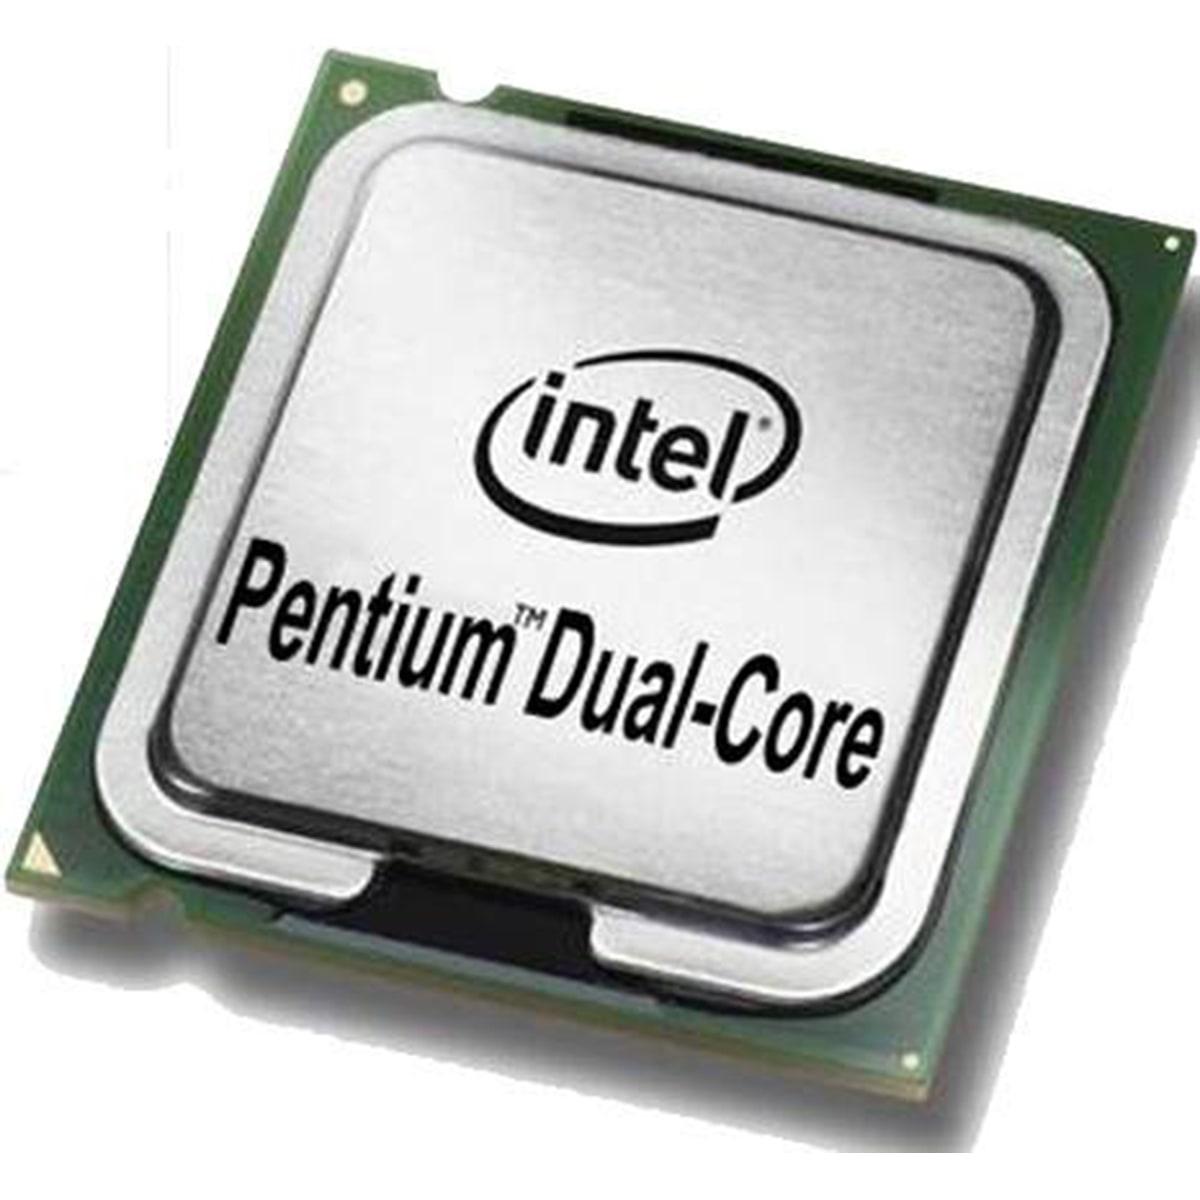 Processador Intel Dual Core E5800 3,20Ghz 2M Cache 800 MHz Socket 775 - Seminovo